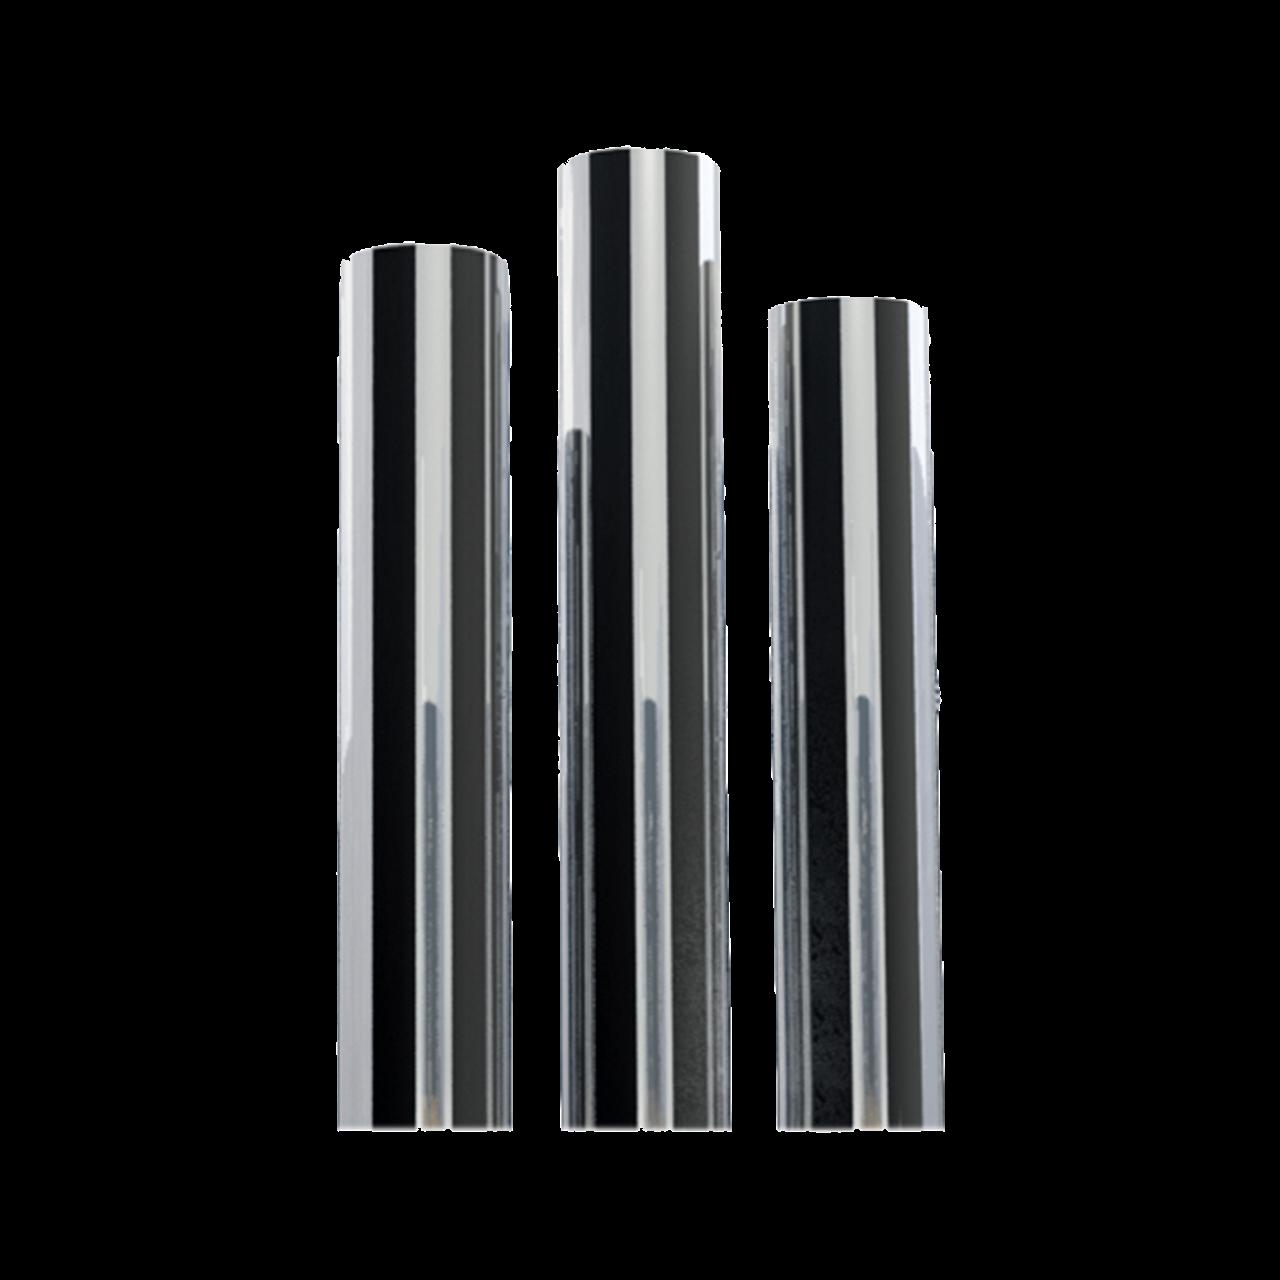 Dynaflex Straight Chrome Stacks